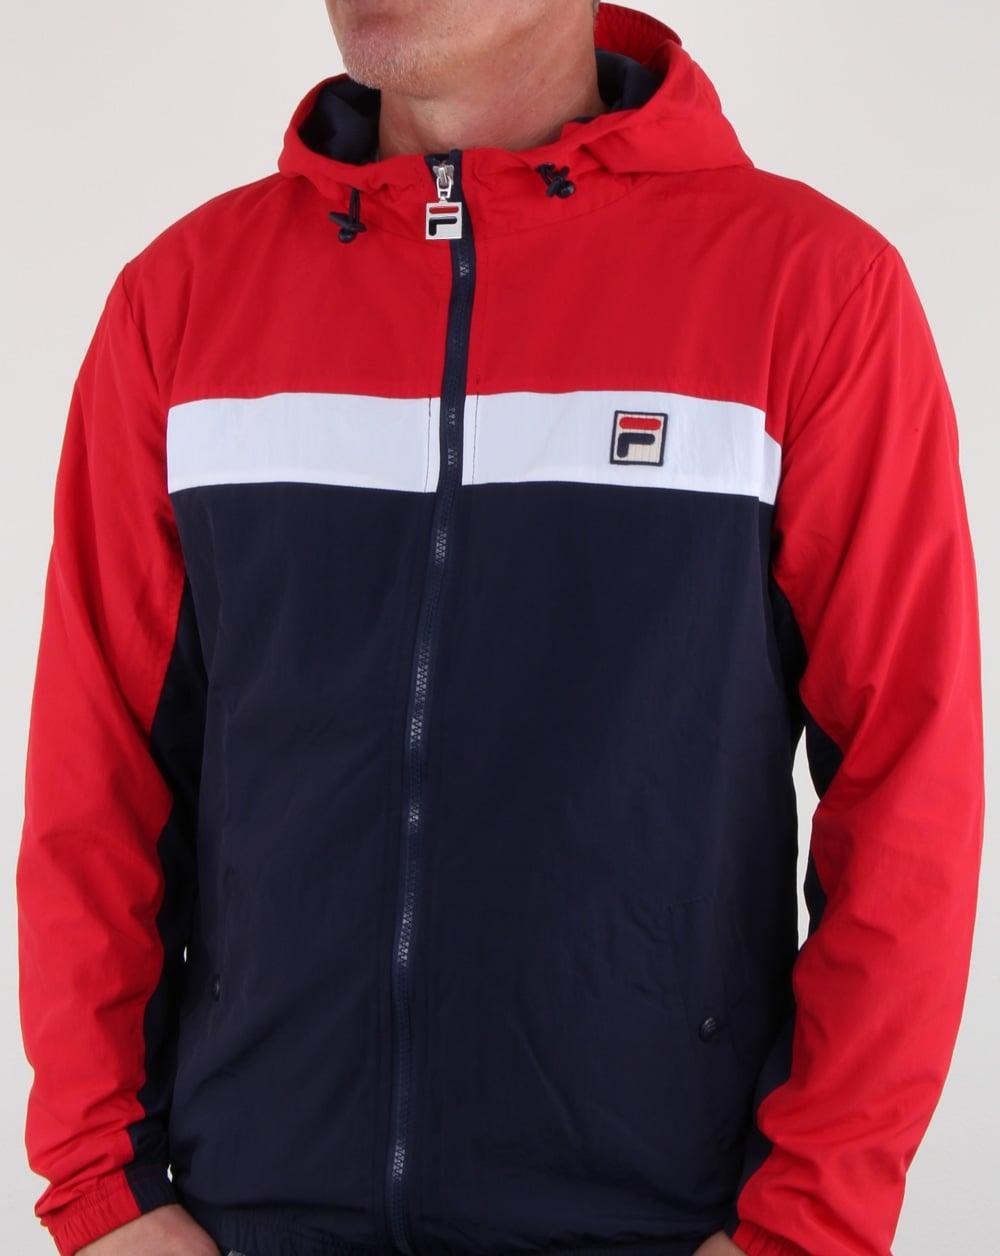 839d40ec Fila Vintage Clipper Jacket Navy/red/white